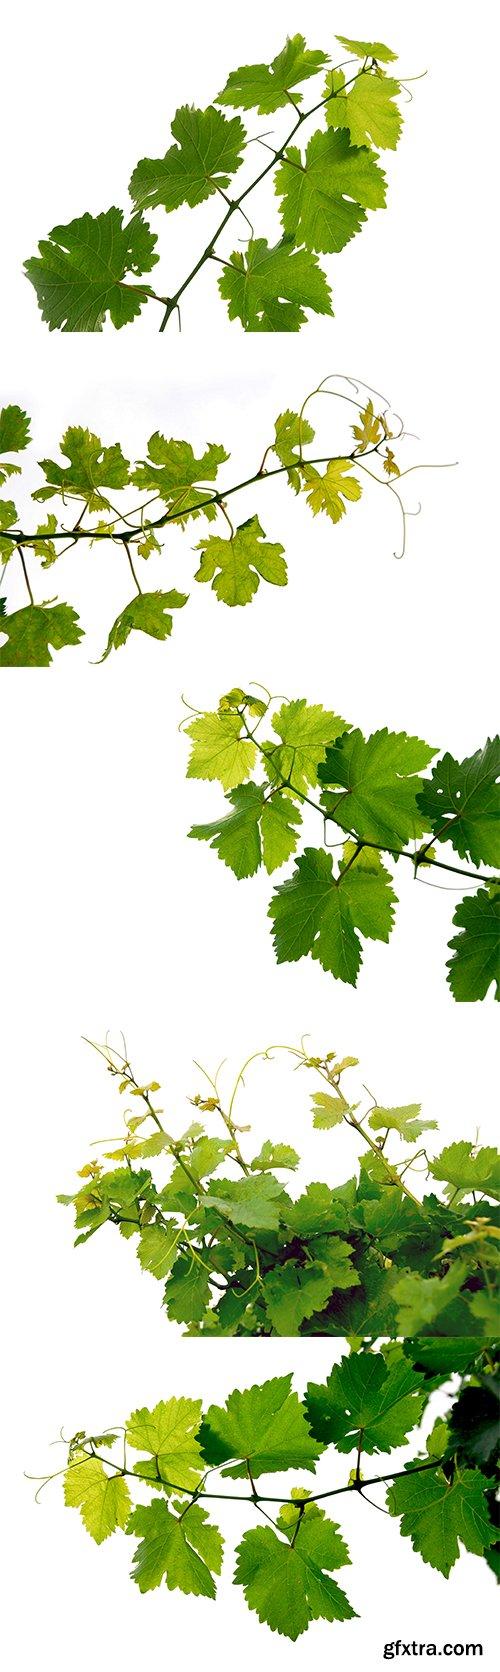 Grape Vine Isolated - 6xJPGs